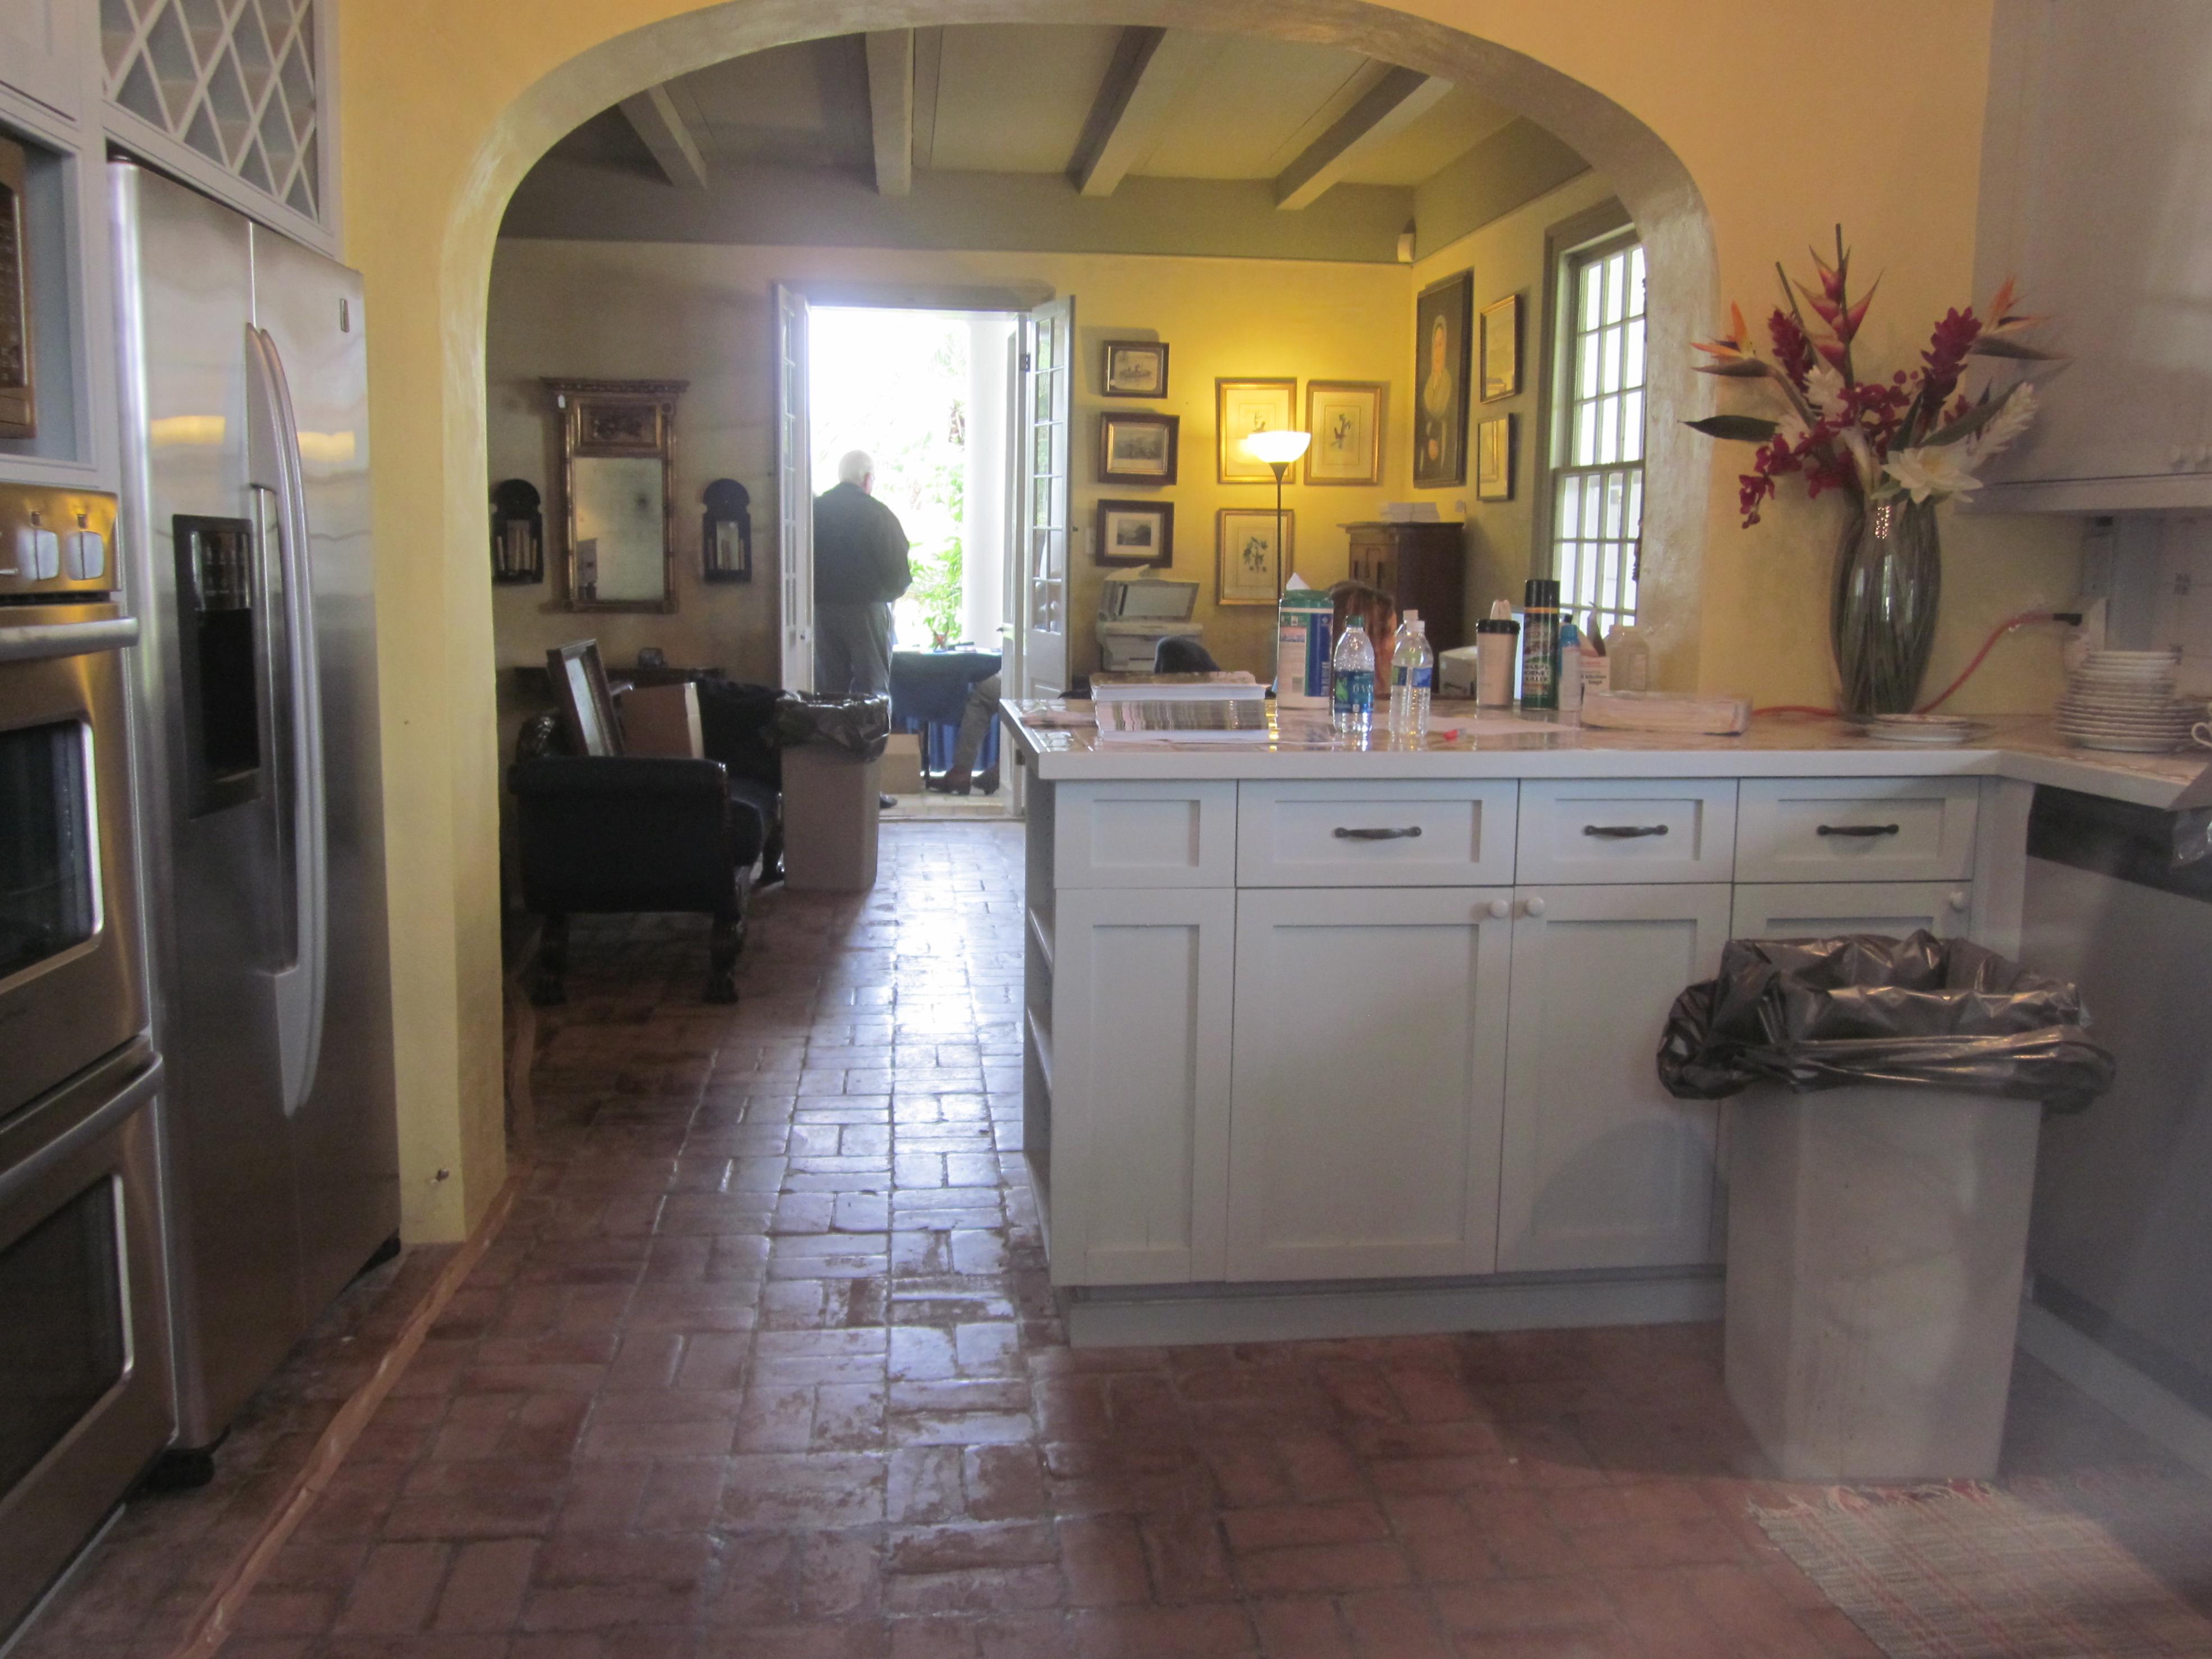 Plantation Kitchen House file:mary plantation house kitchen 7 - wikimedia commons